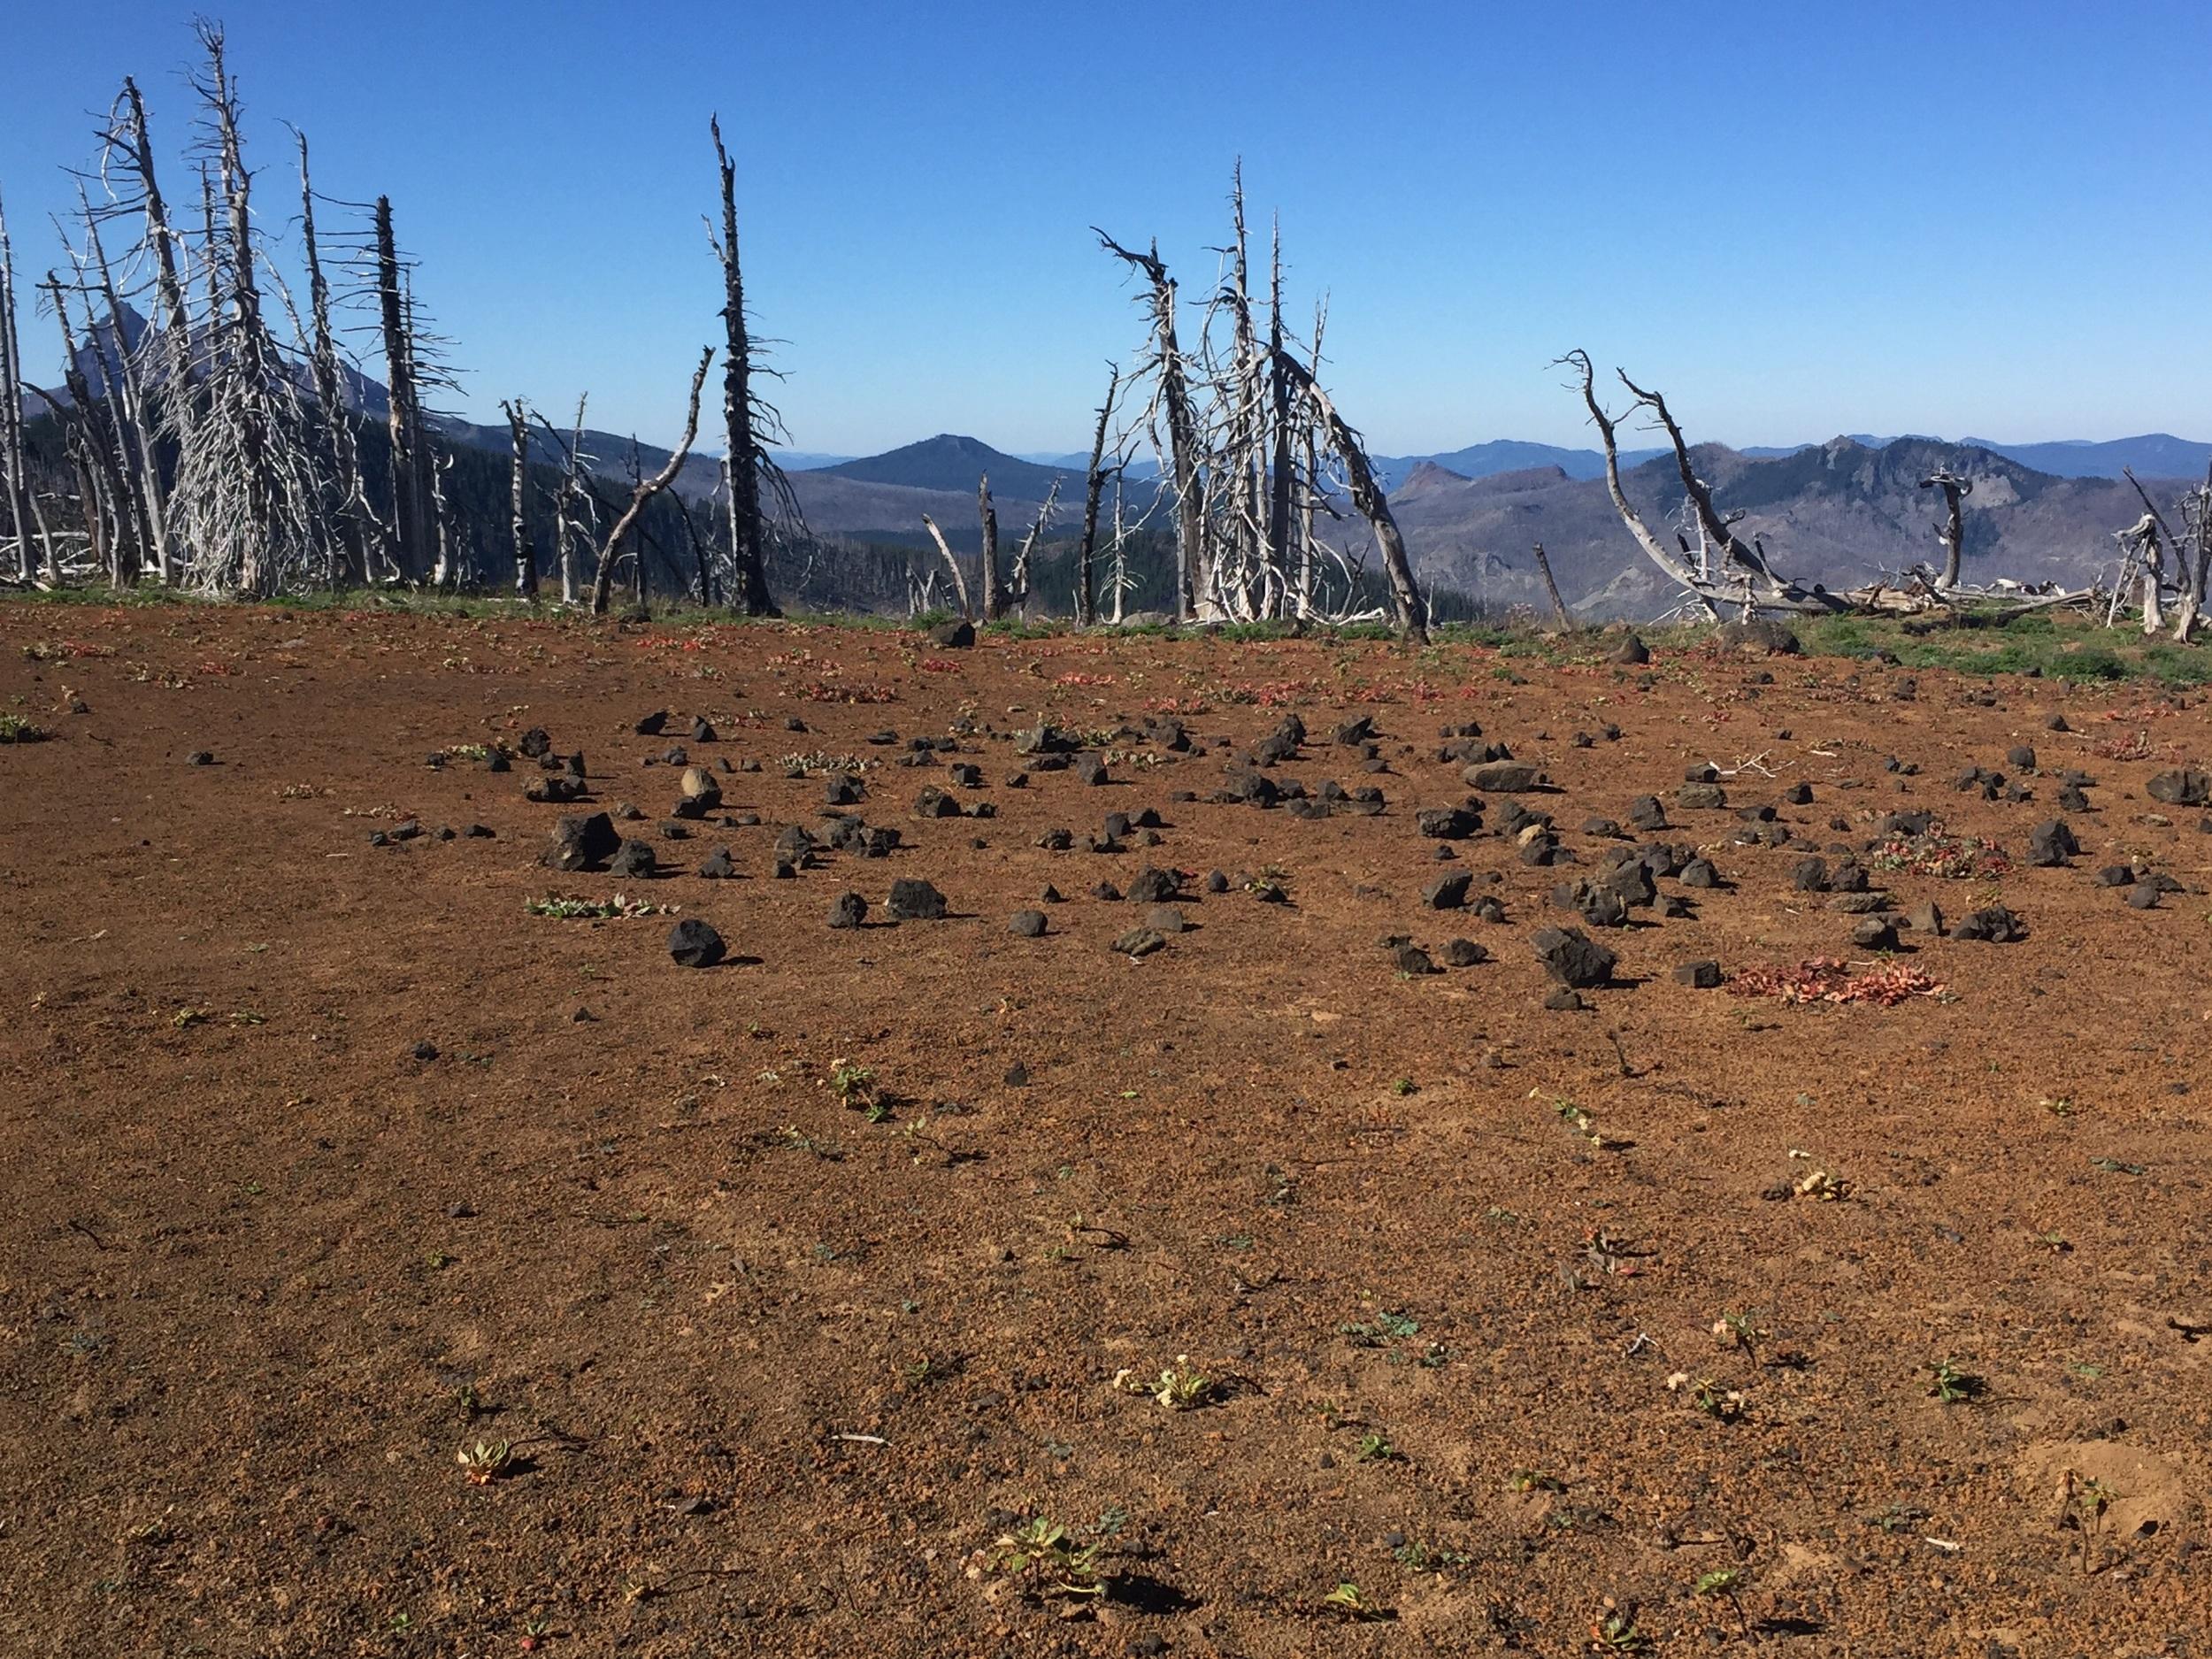 Volcanic bocce court? A high plateau as we continue south towards Rockpile Lake